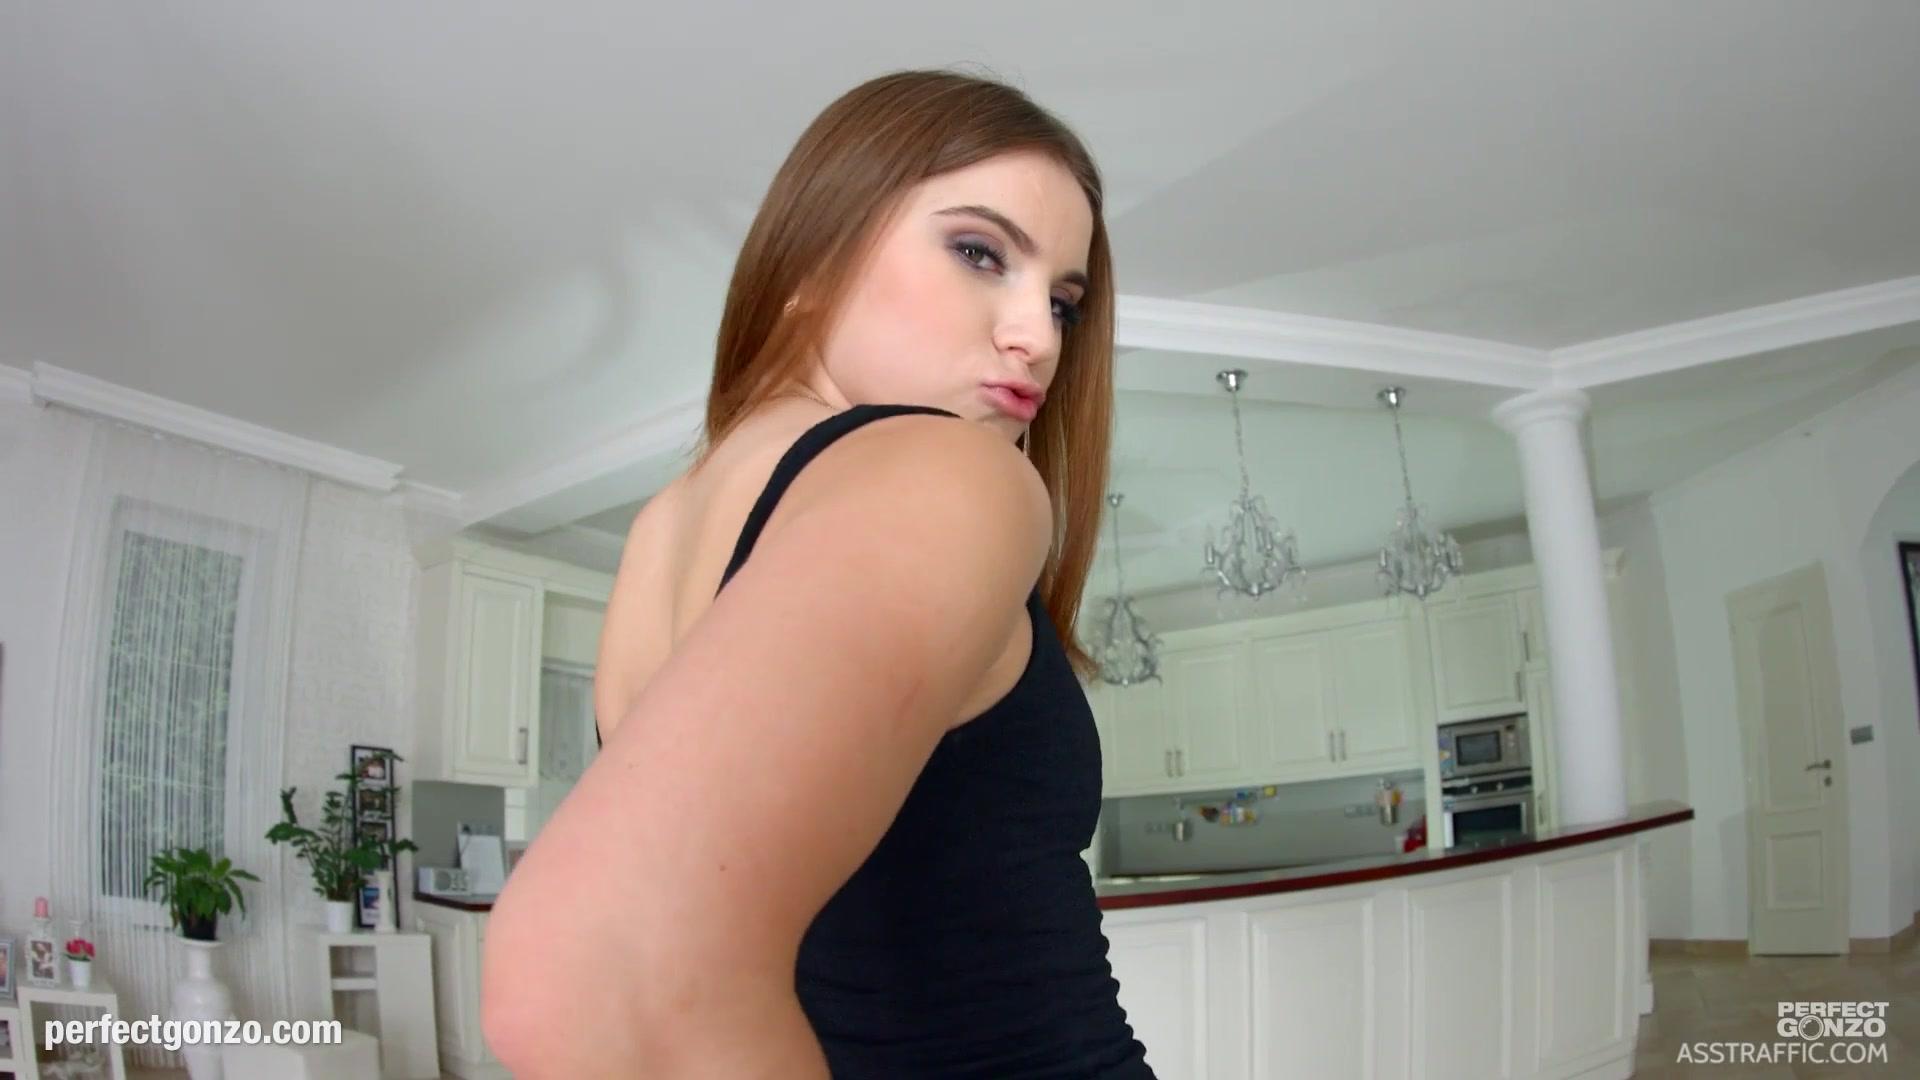 Marina lopez pics Porn archive